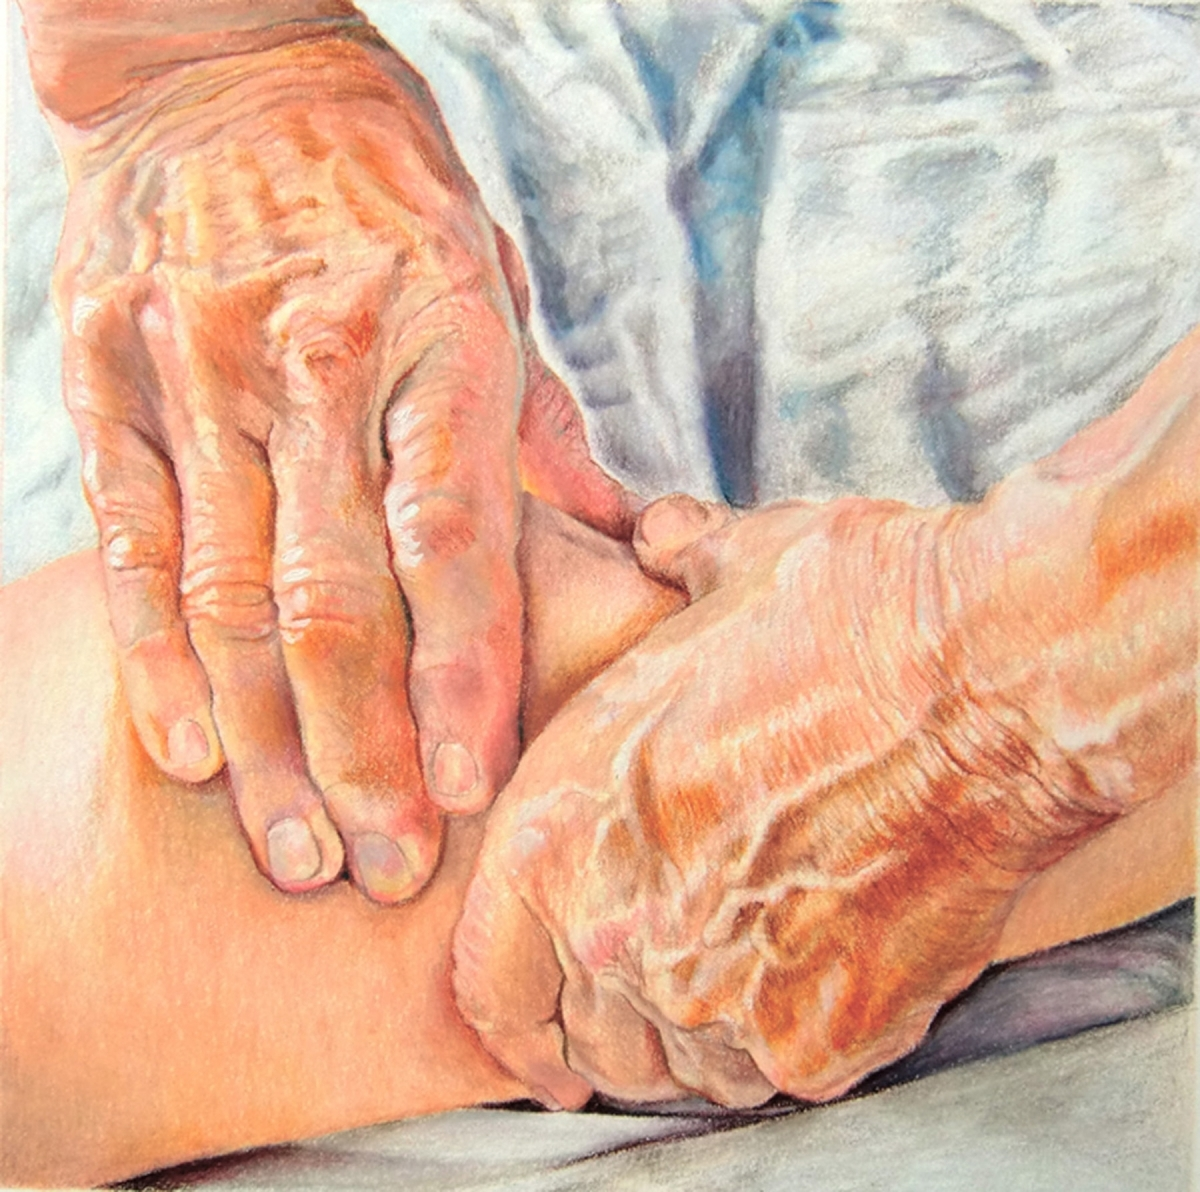 Massage Series 2 (large view)